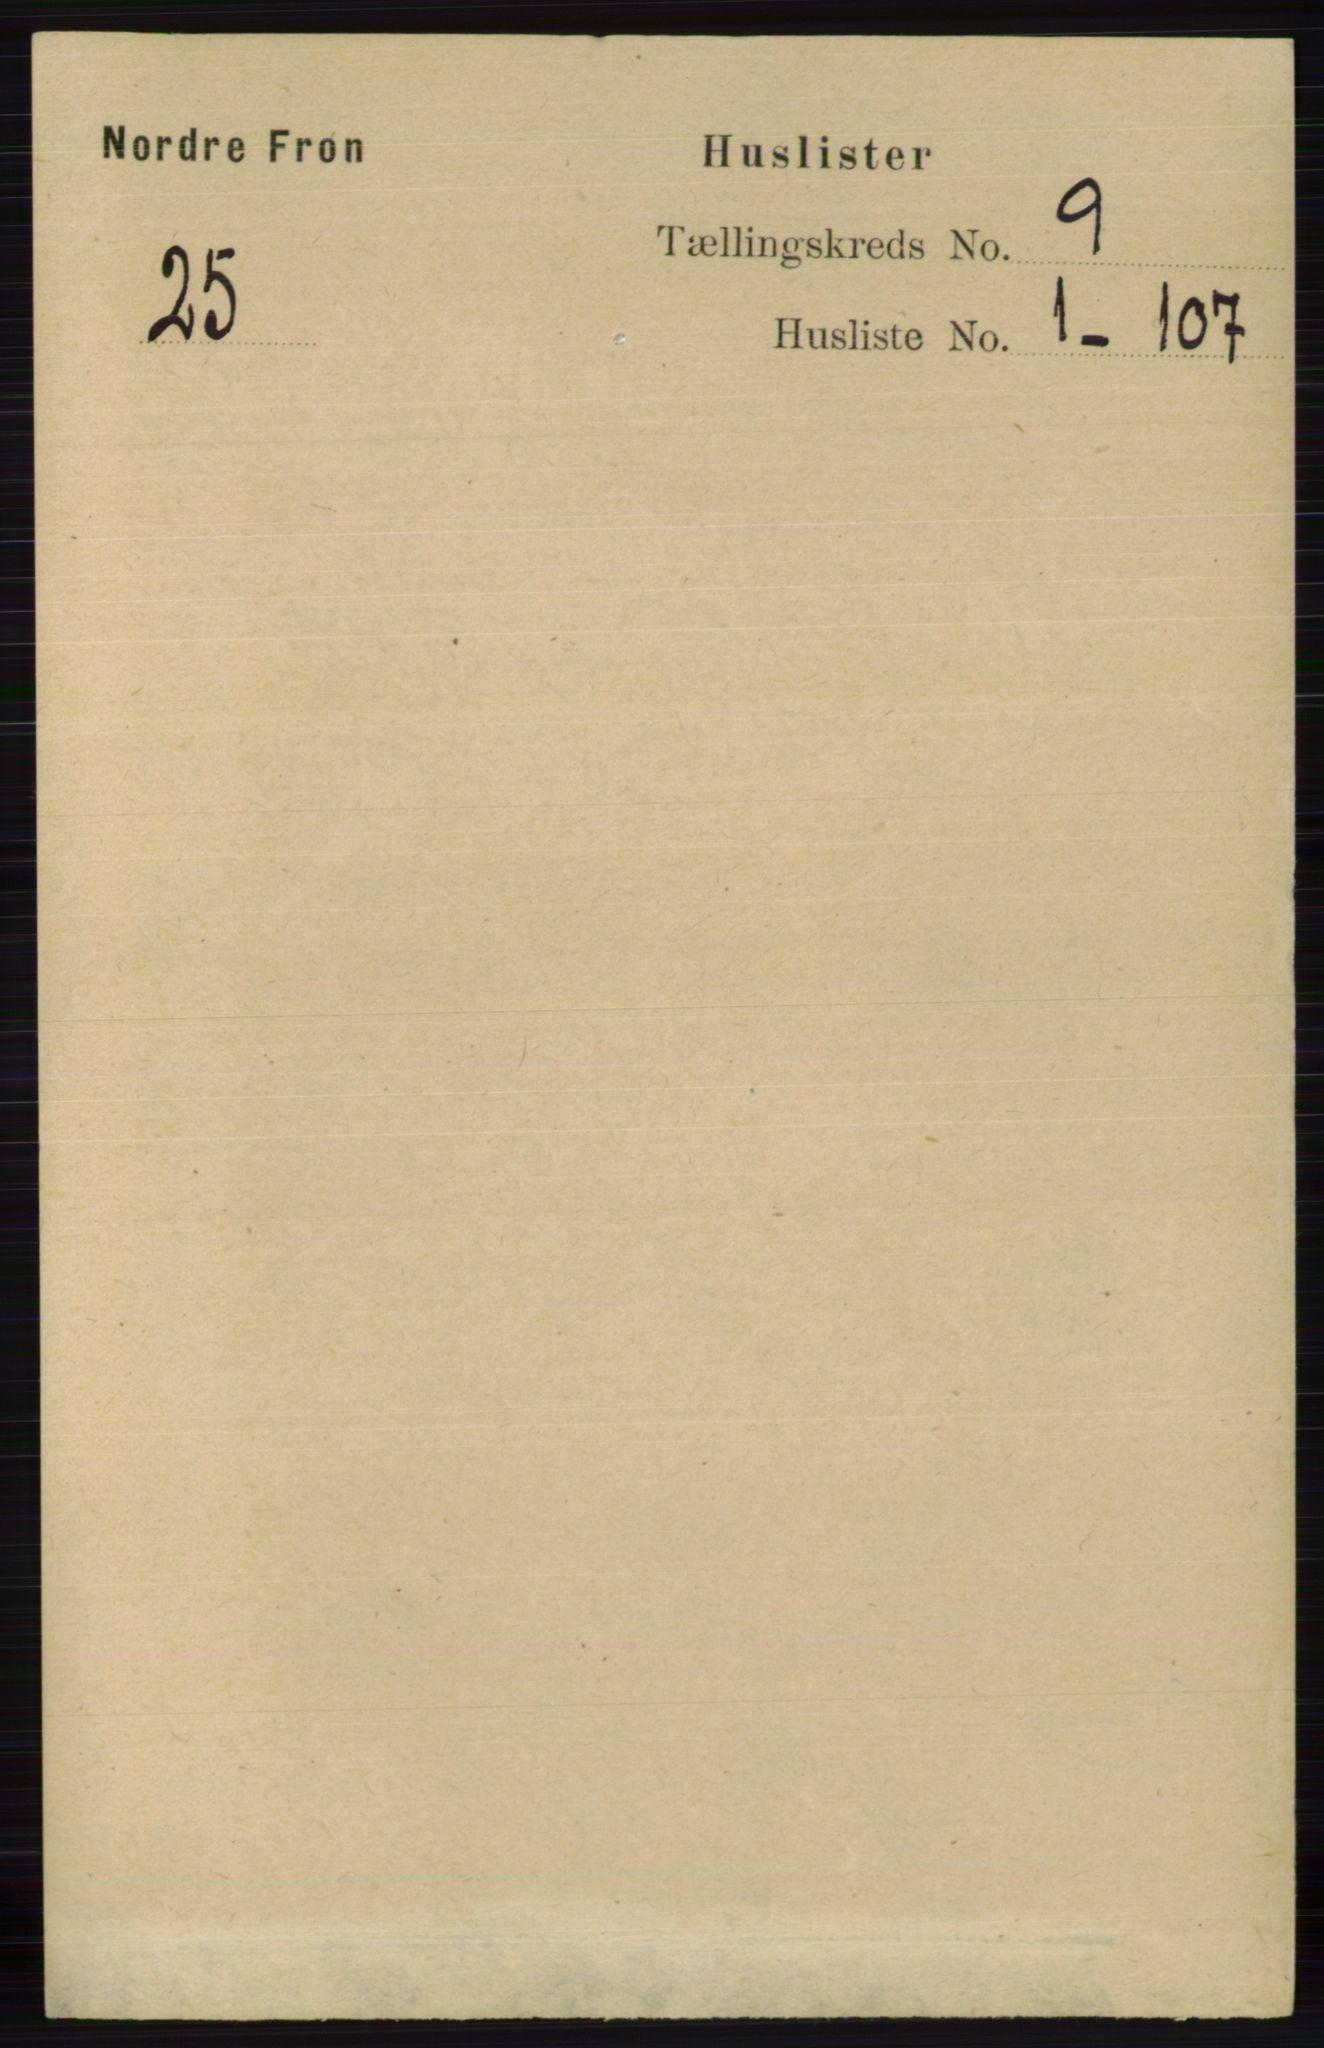 RA, Folketelling 1891 for 0518 Nord-Fron herred, 1891, s. 3594